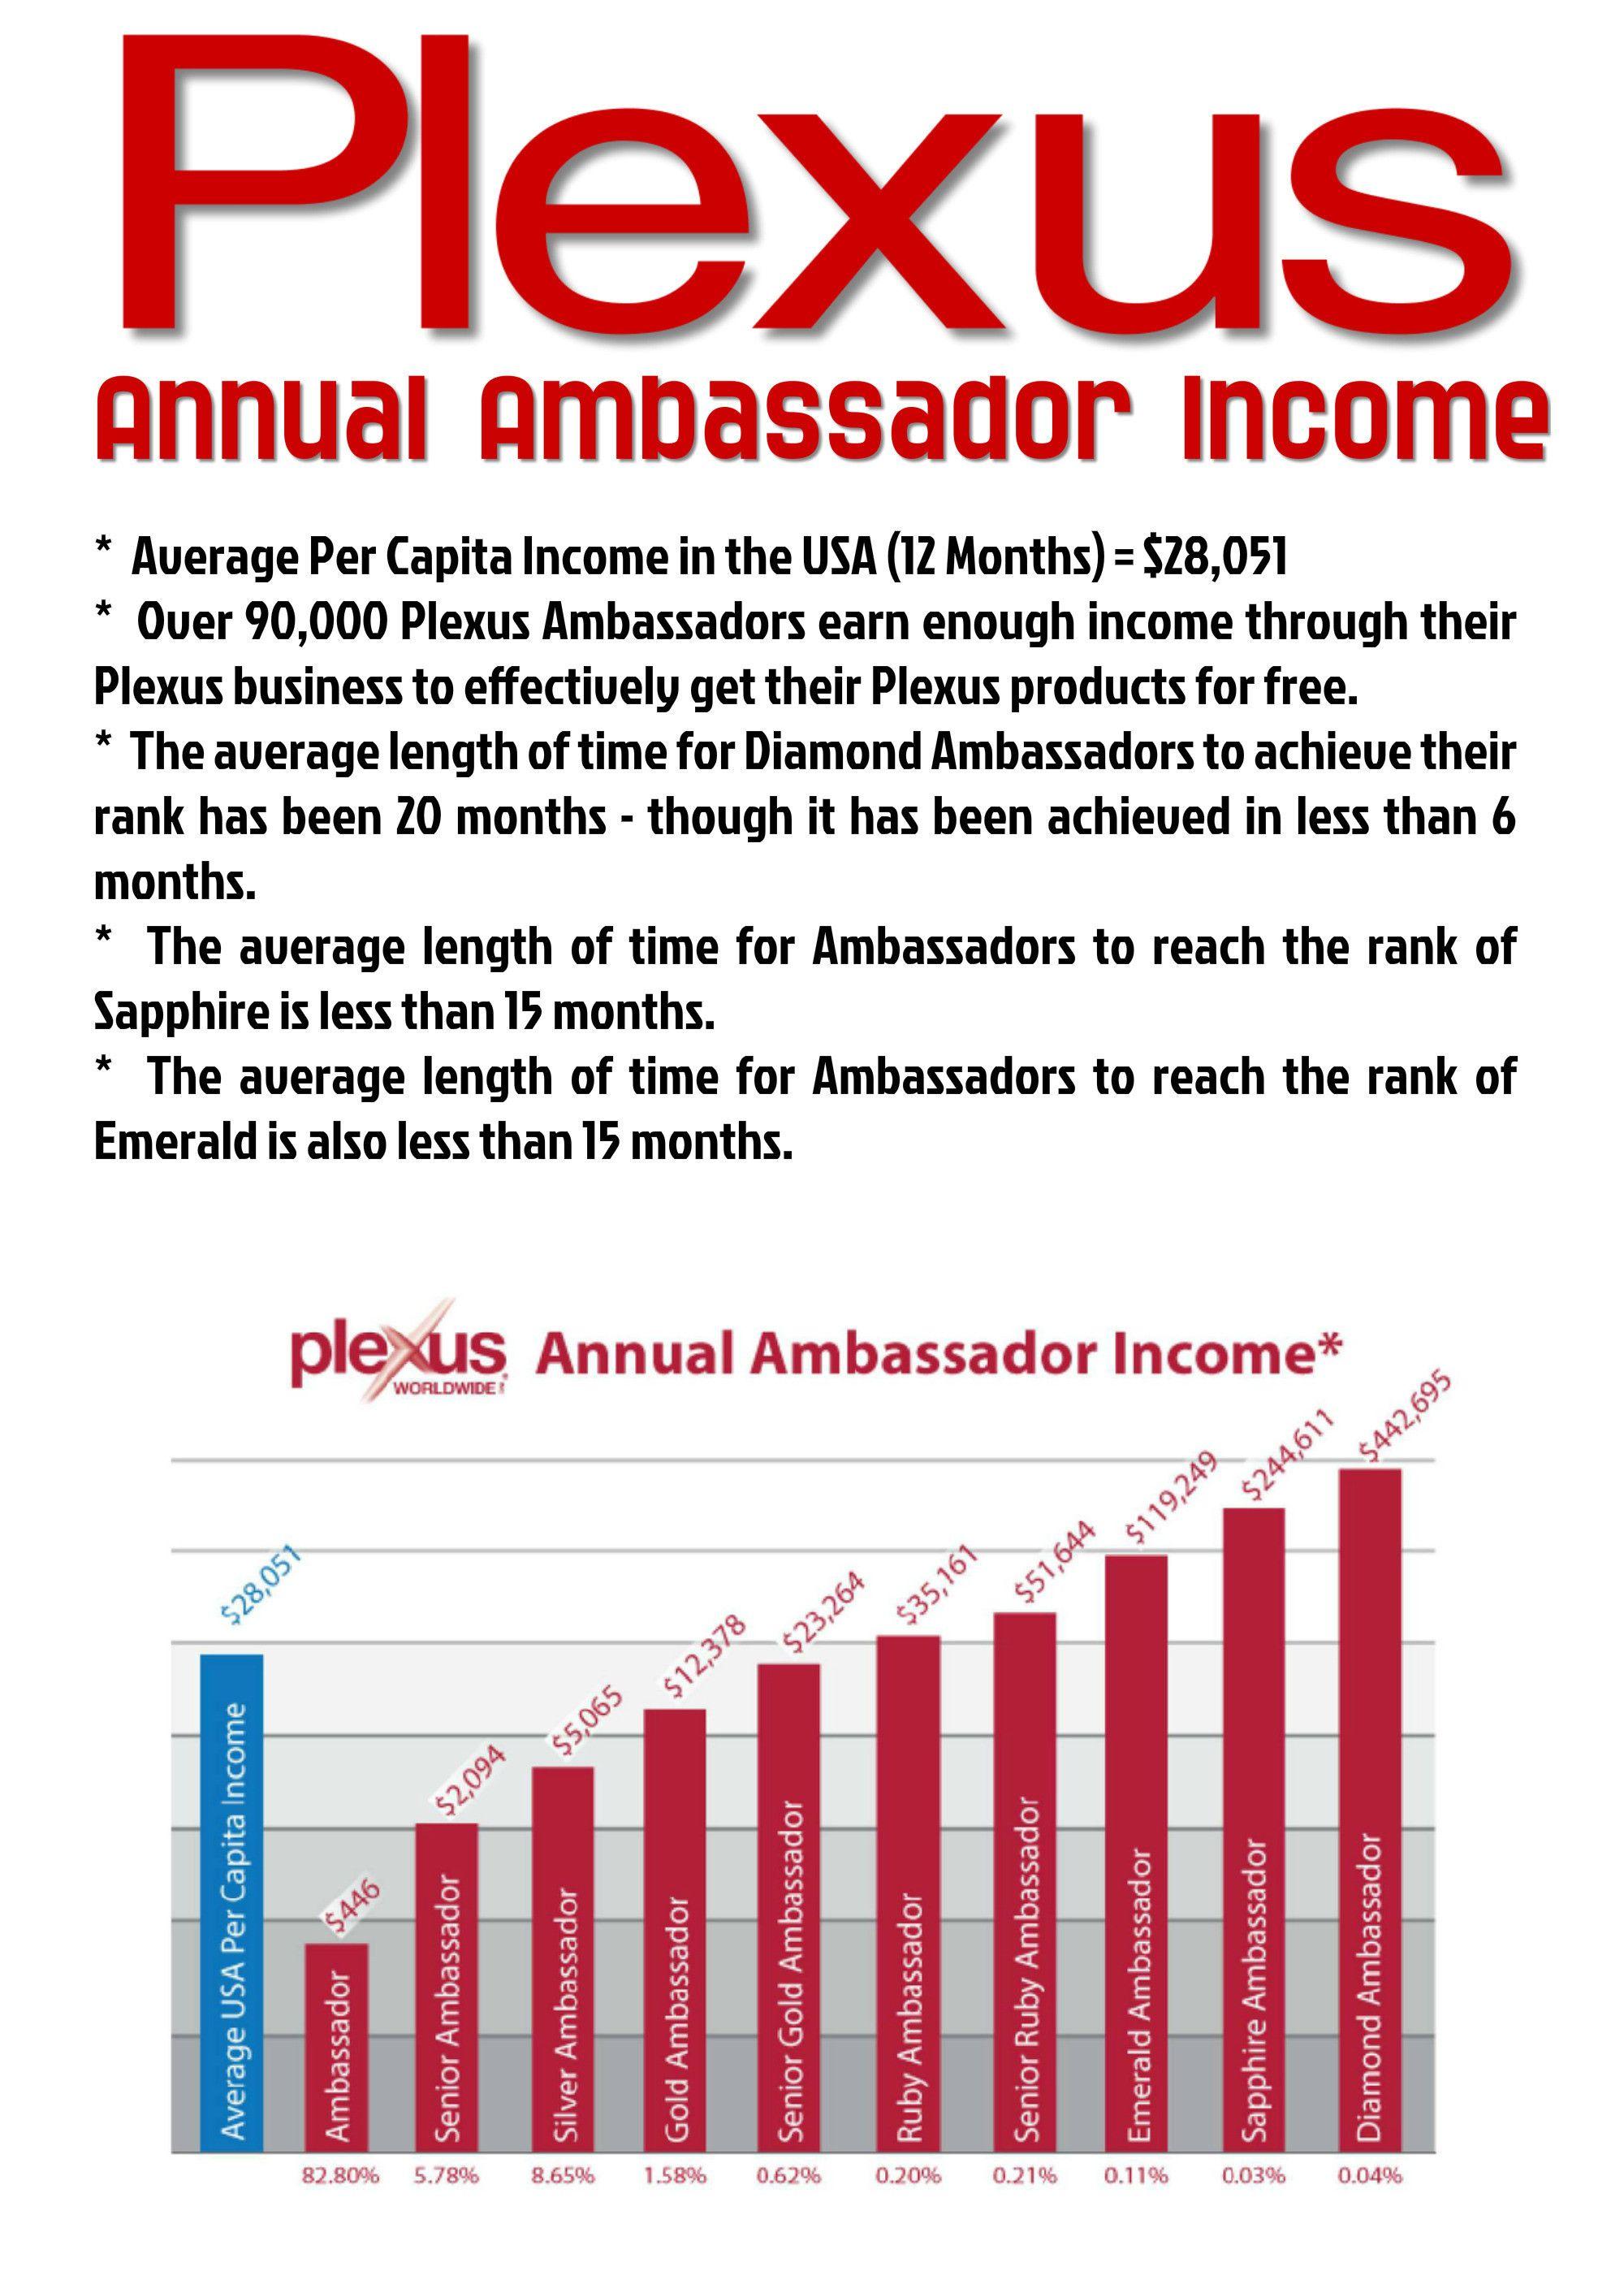 Plexus Ambador Income